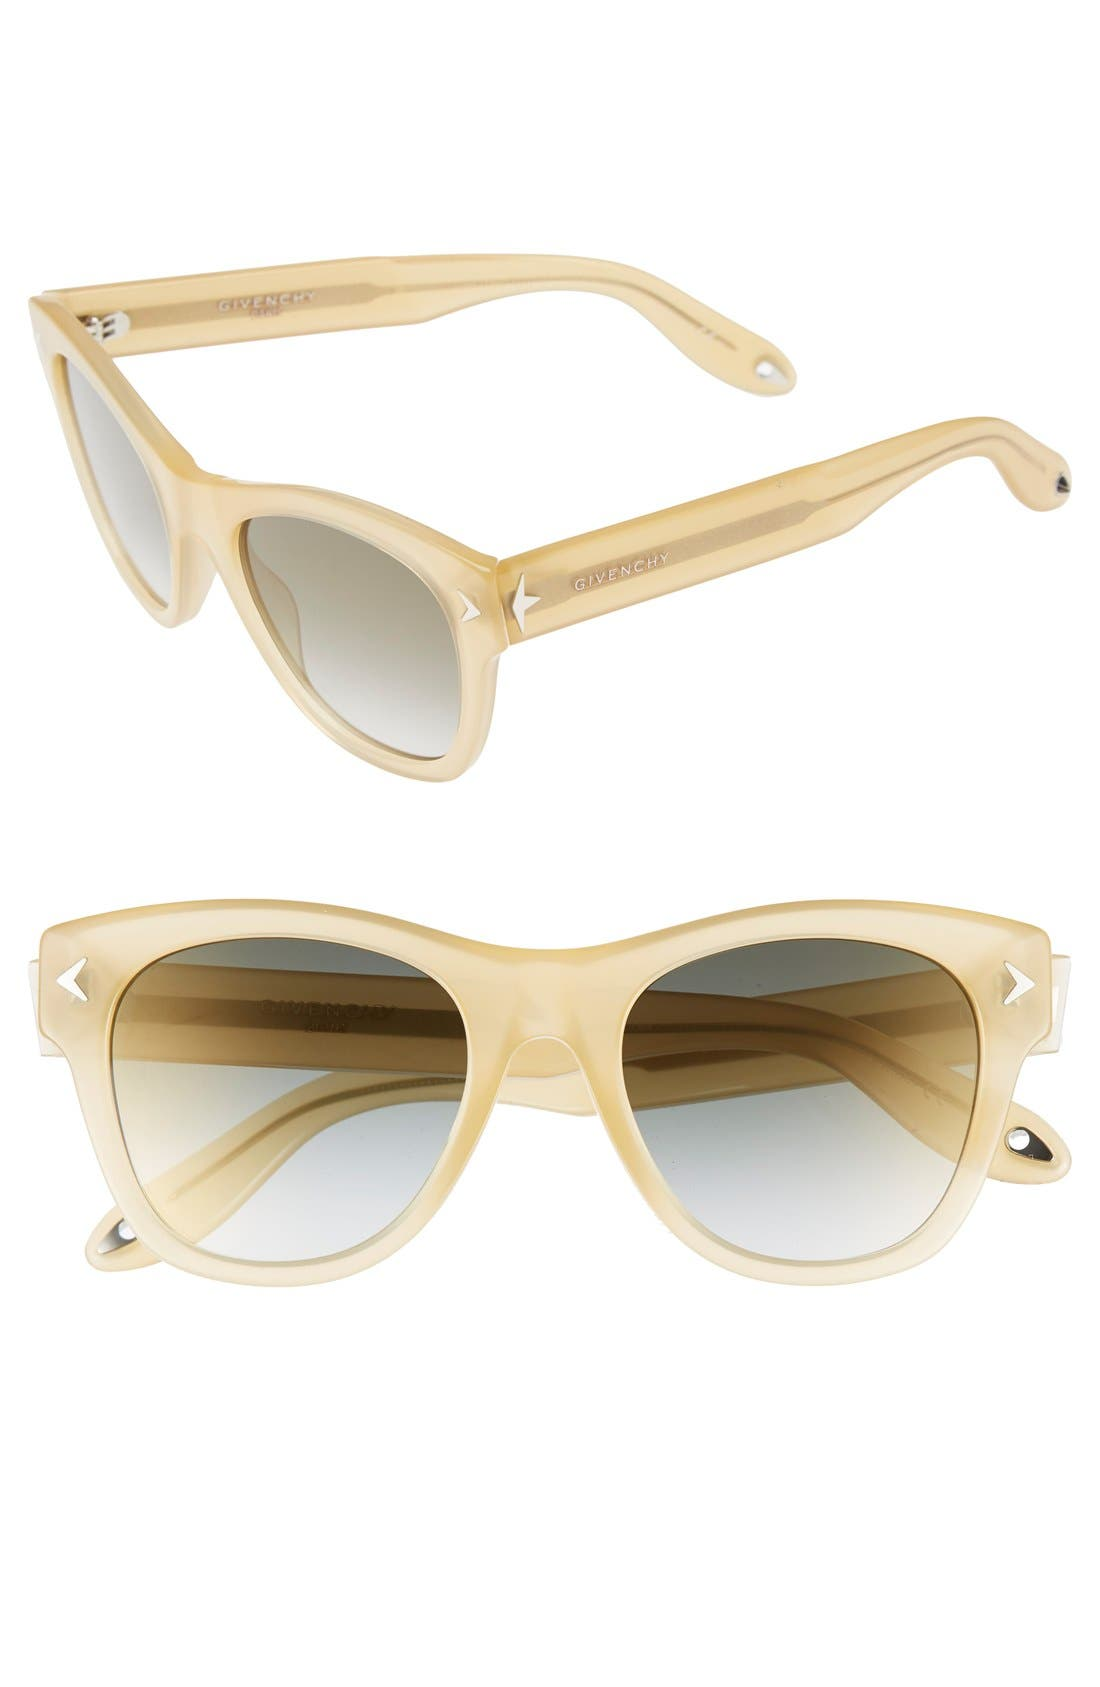 Givenchy 51mm Retro Sunglasses